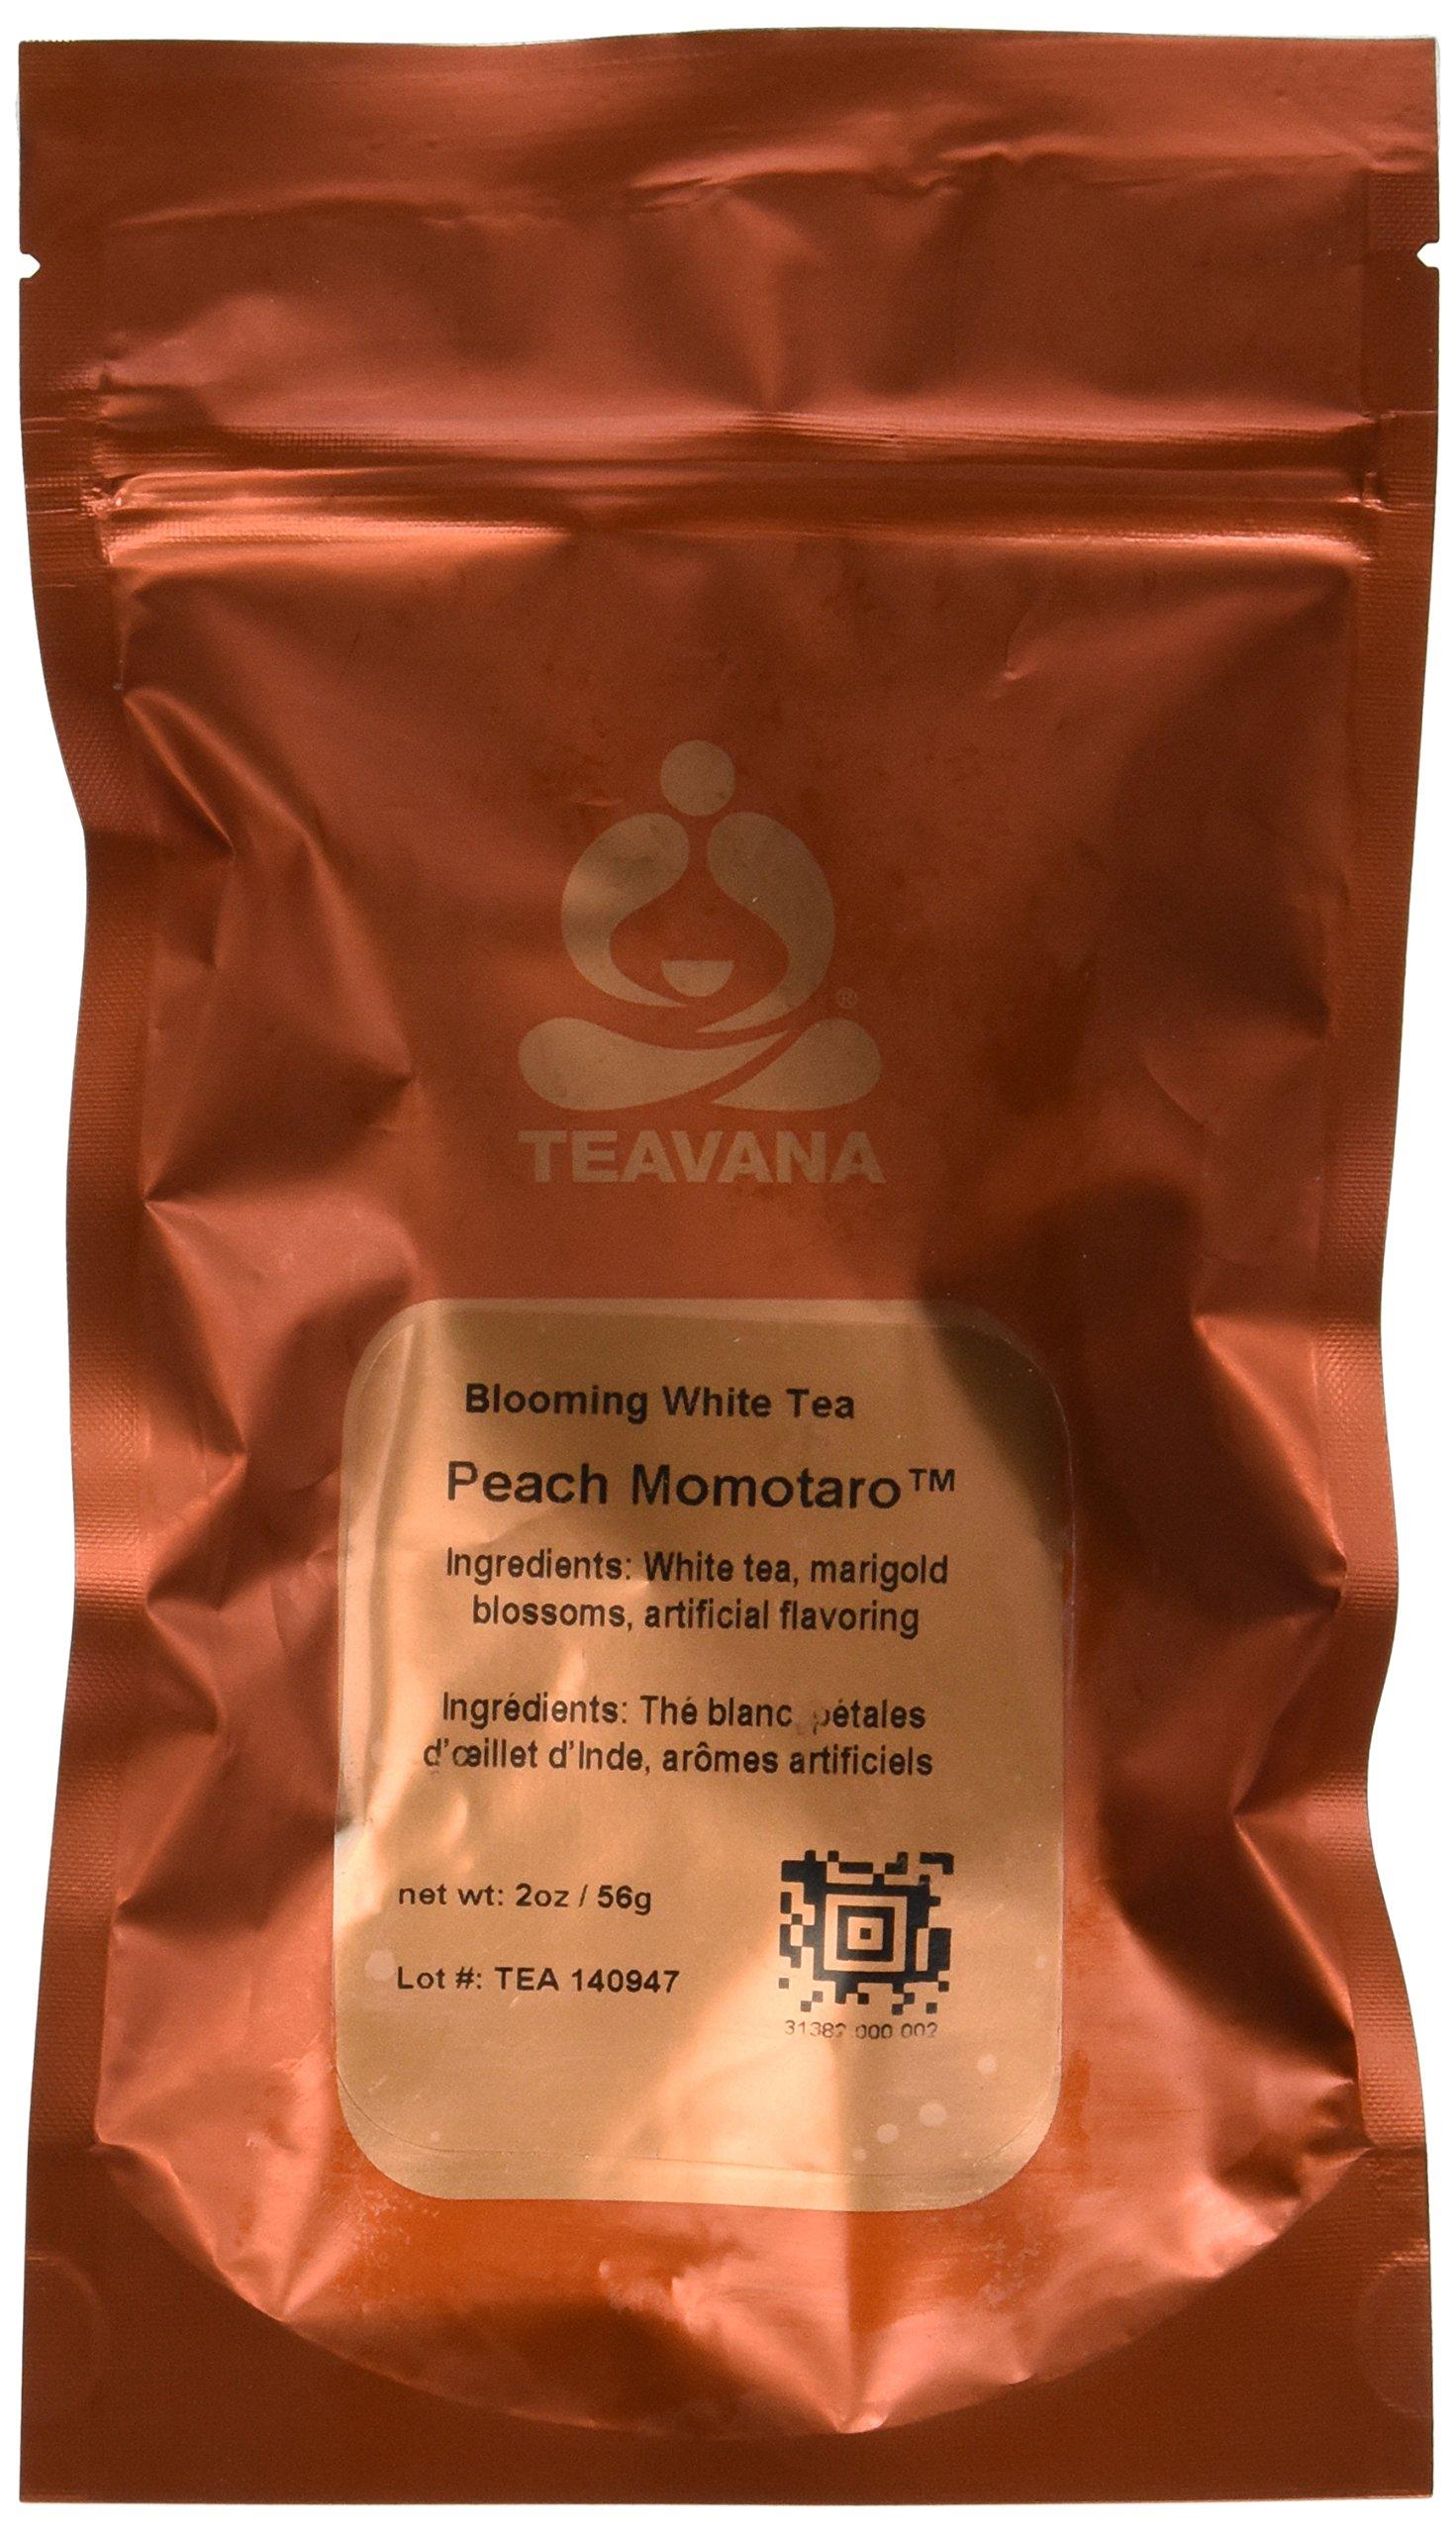 Teavana Peach Momotaro Blooming Flower Tea, 2oz by Teavana